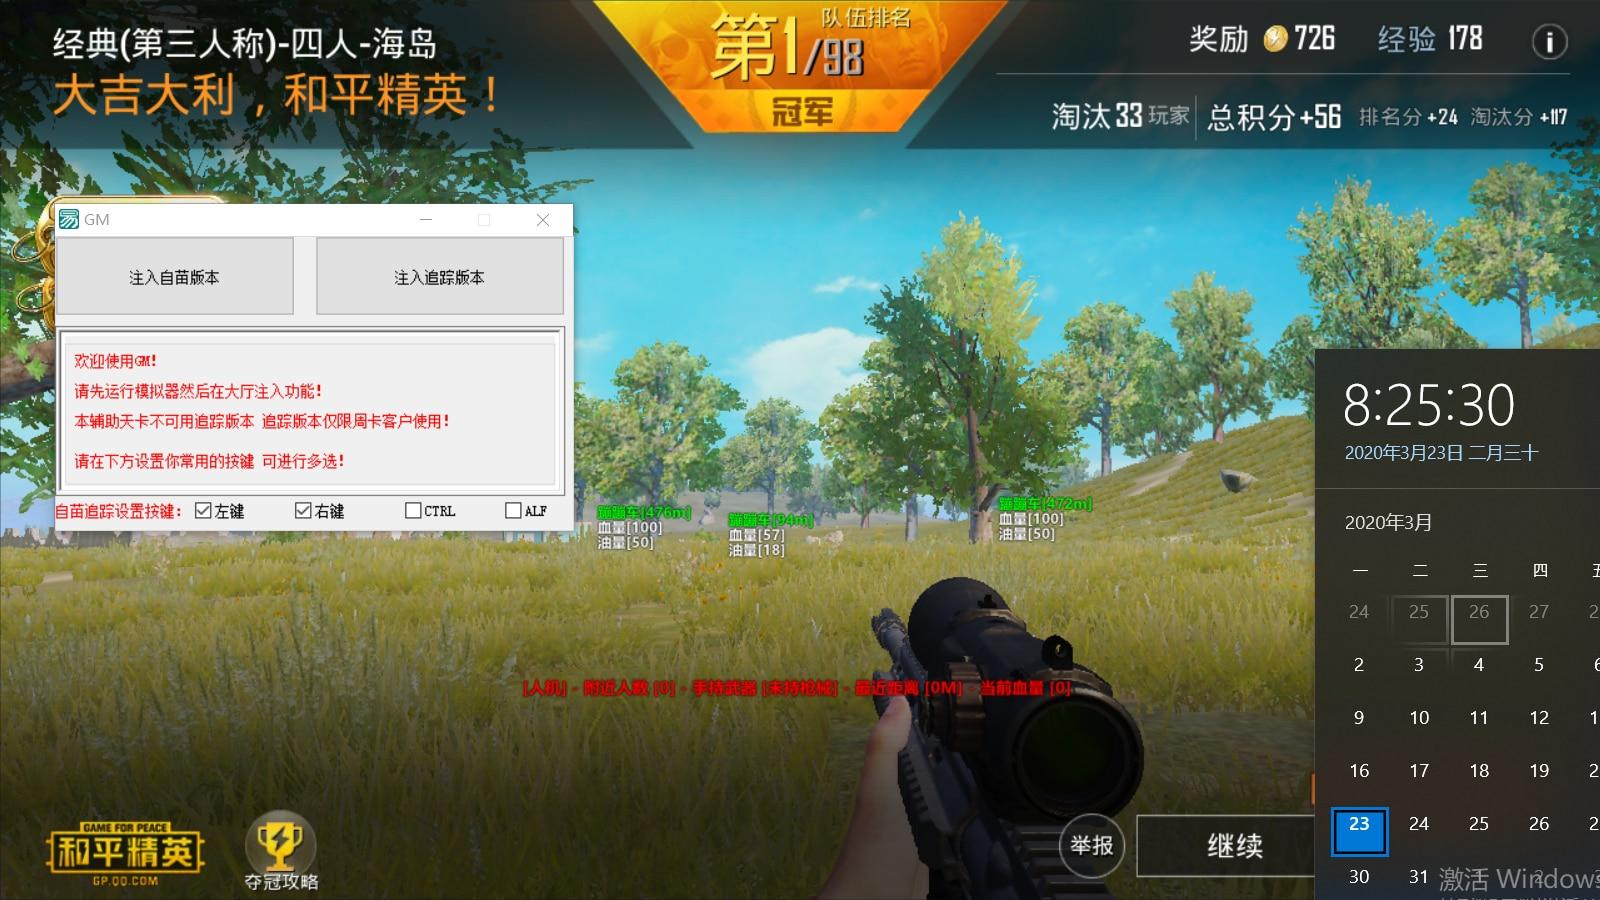 PC和平精英_GM透视自瞄辅助破解版v3.23